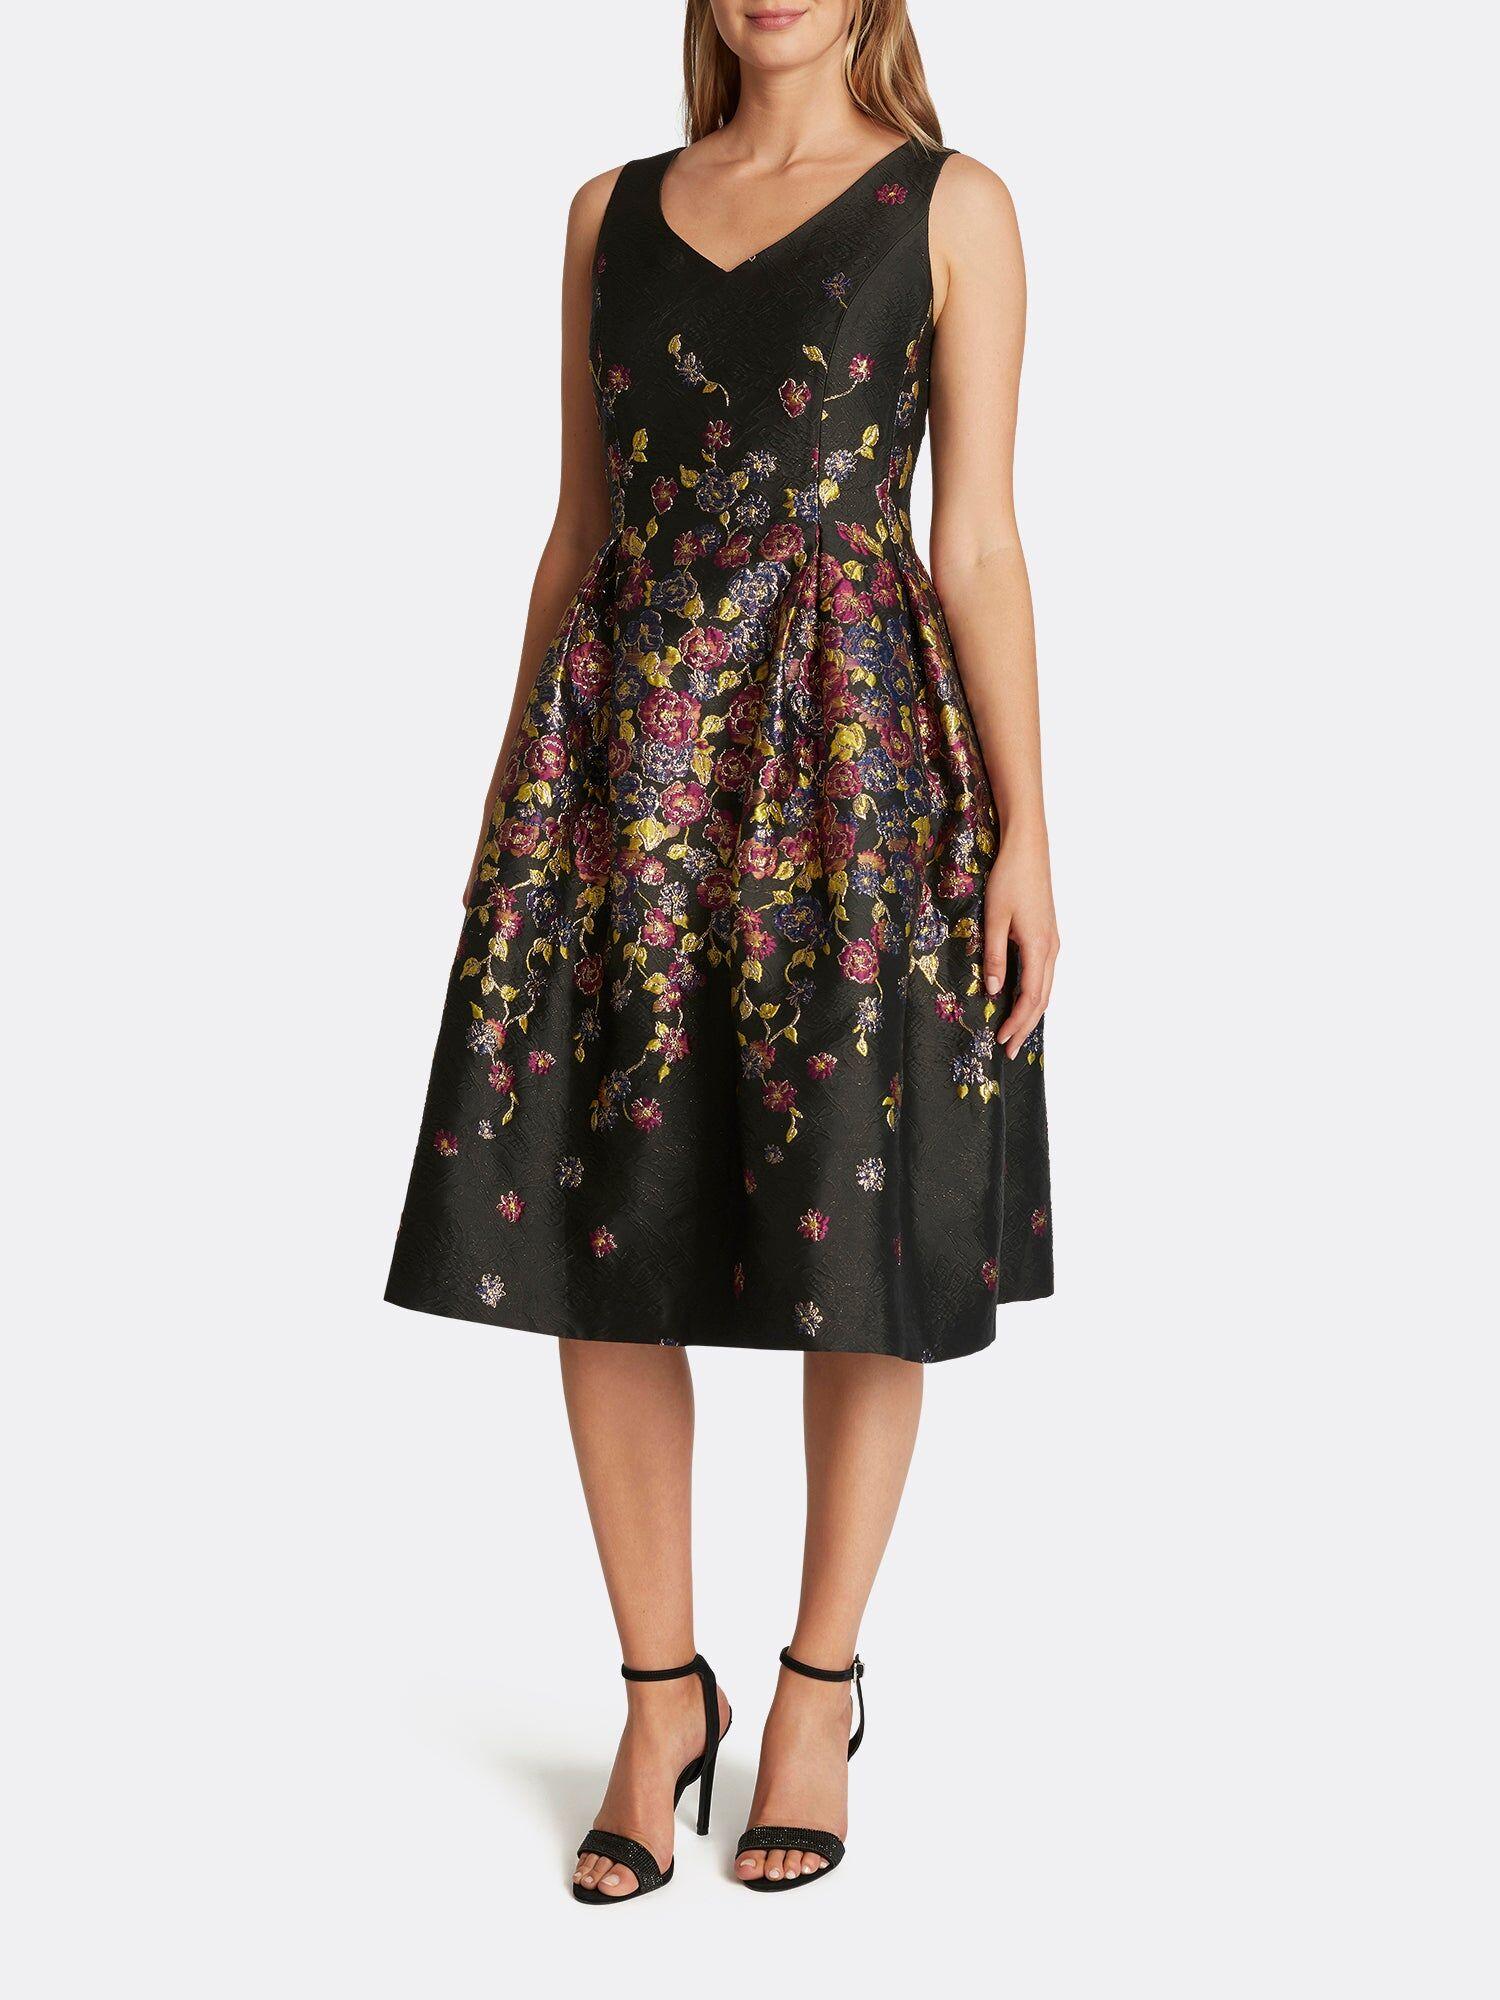 Tahari ASL Lurex Floral Jacquard Midi Dress Black Aster Garden Size: 10